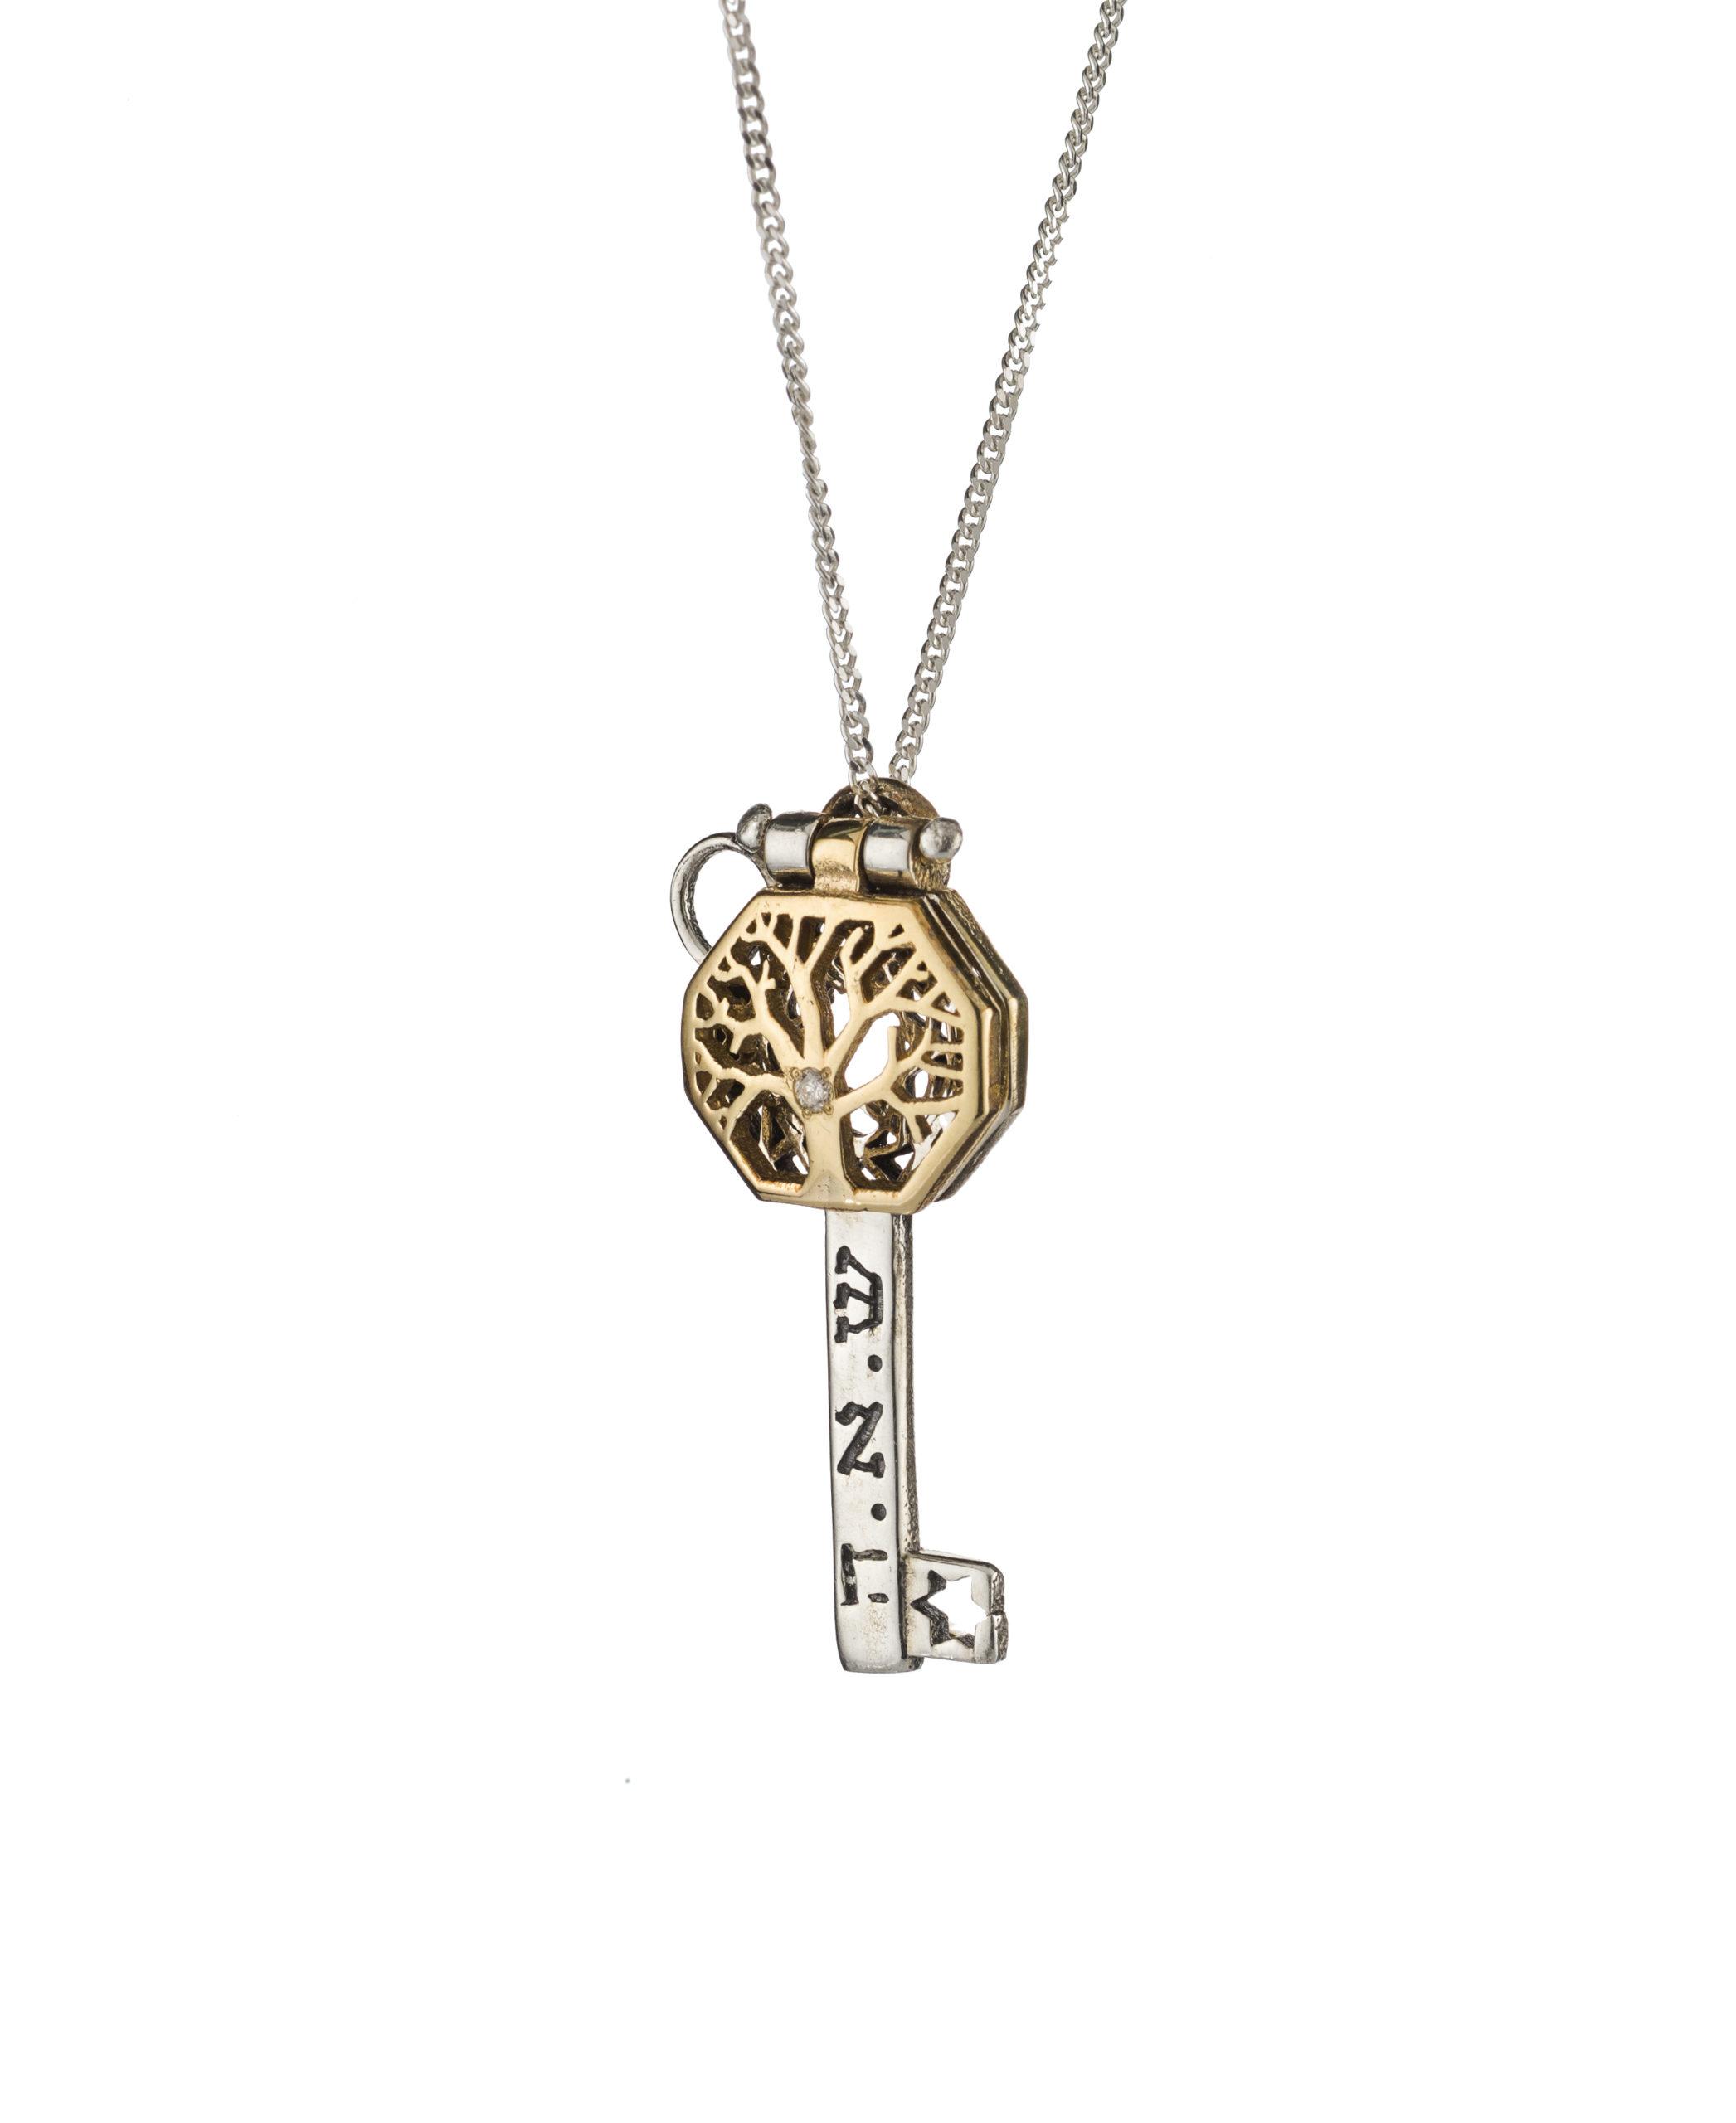 Tree of Life Health & Longevity Key Pendant - Baltinester Jewelry